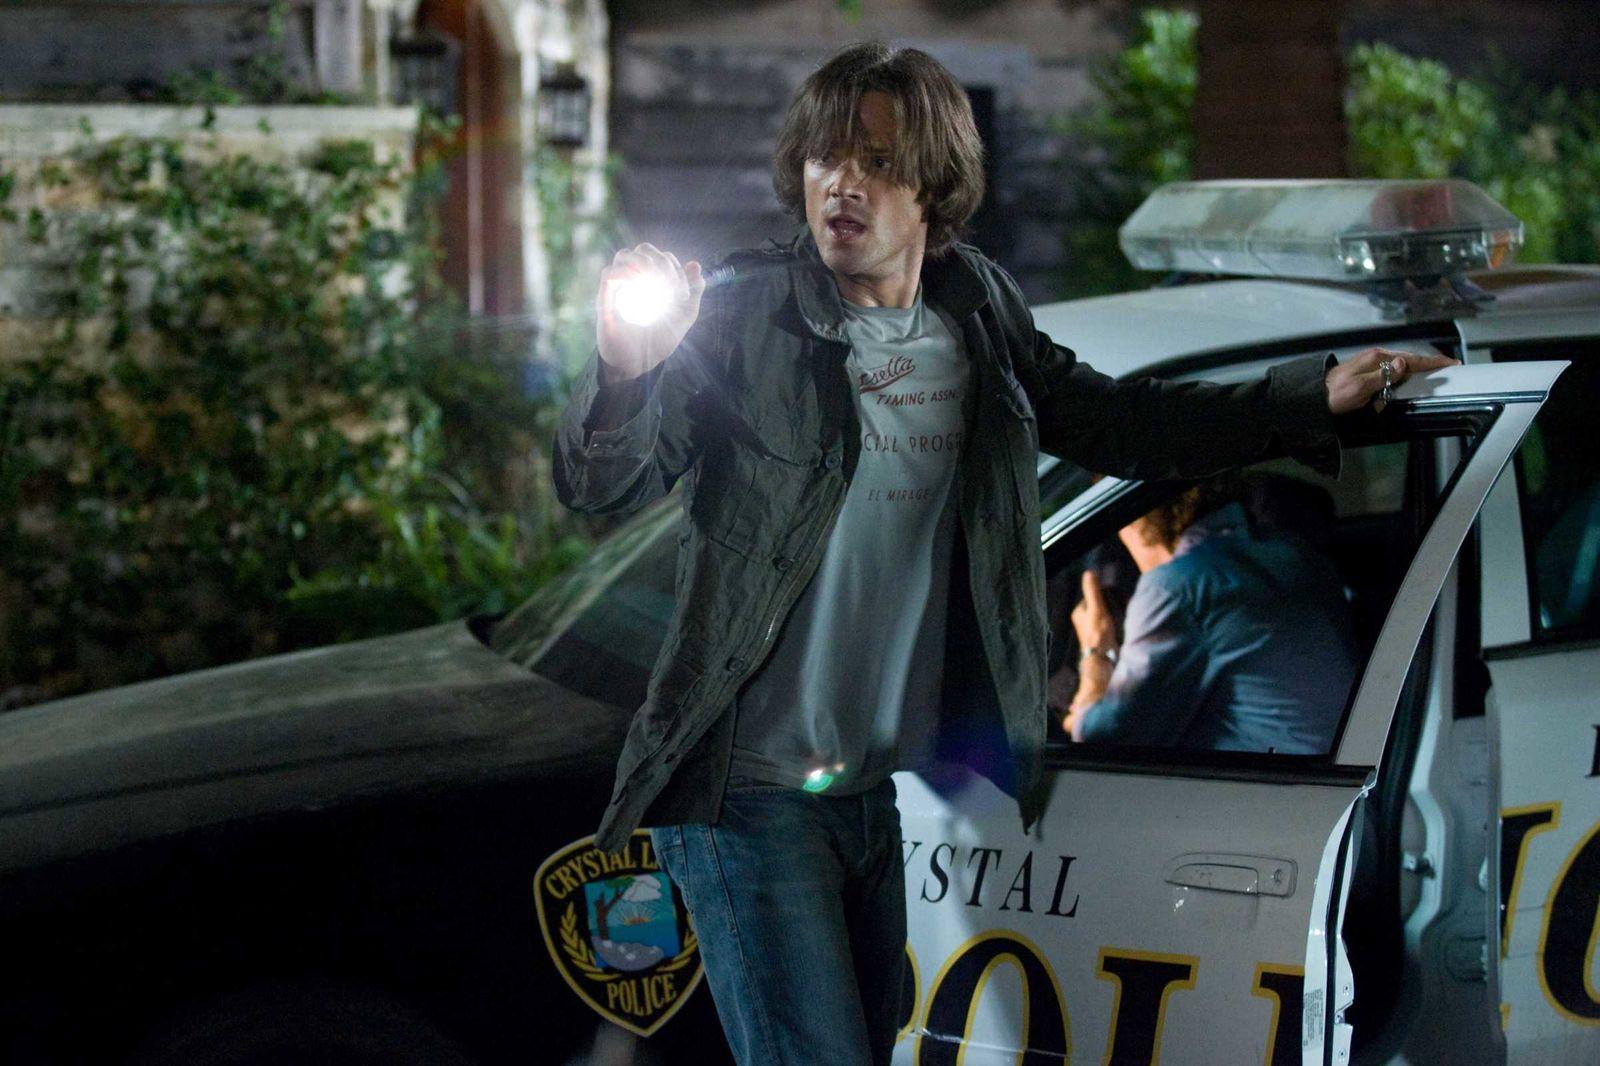 Vineri 13 - Friday the 13th (2009) Online Subtitrat in Romana